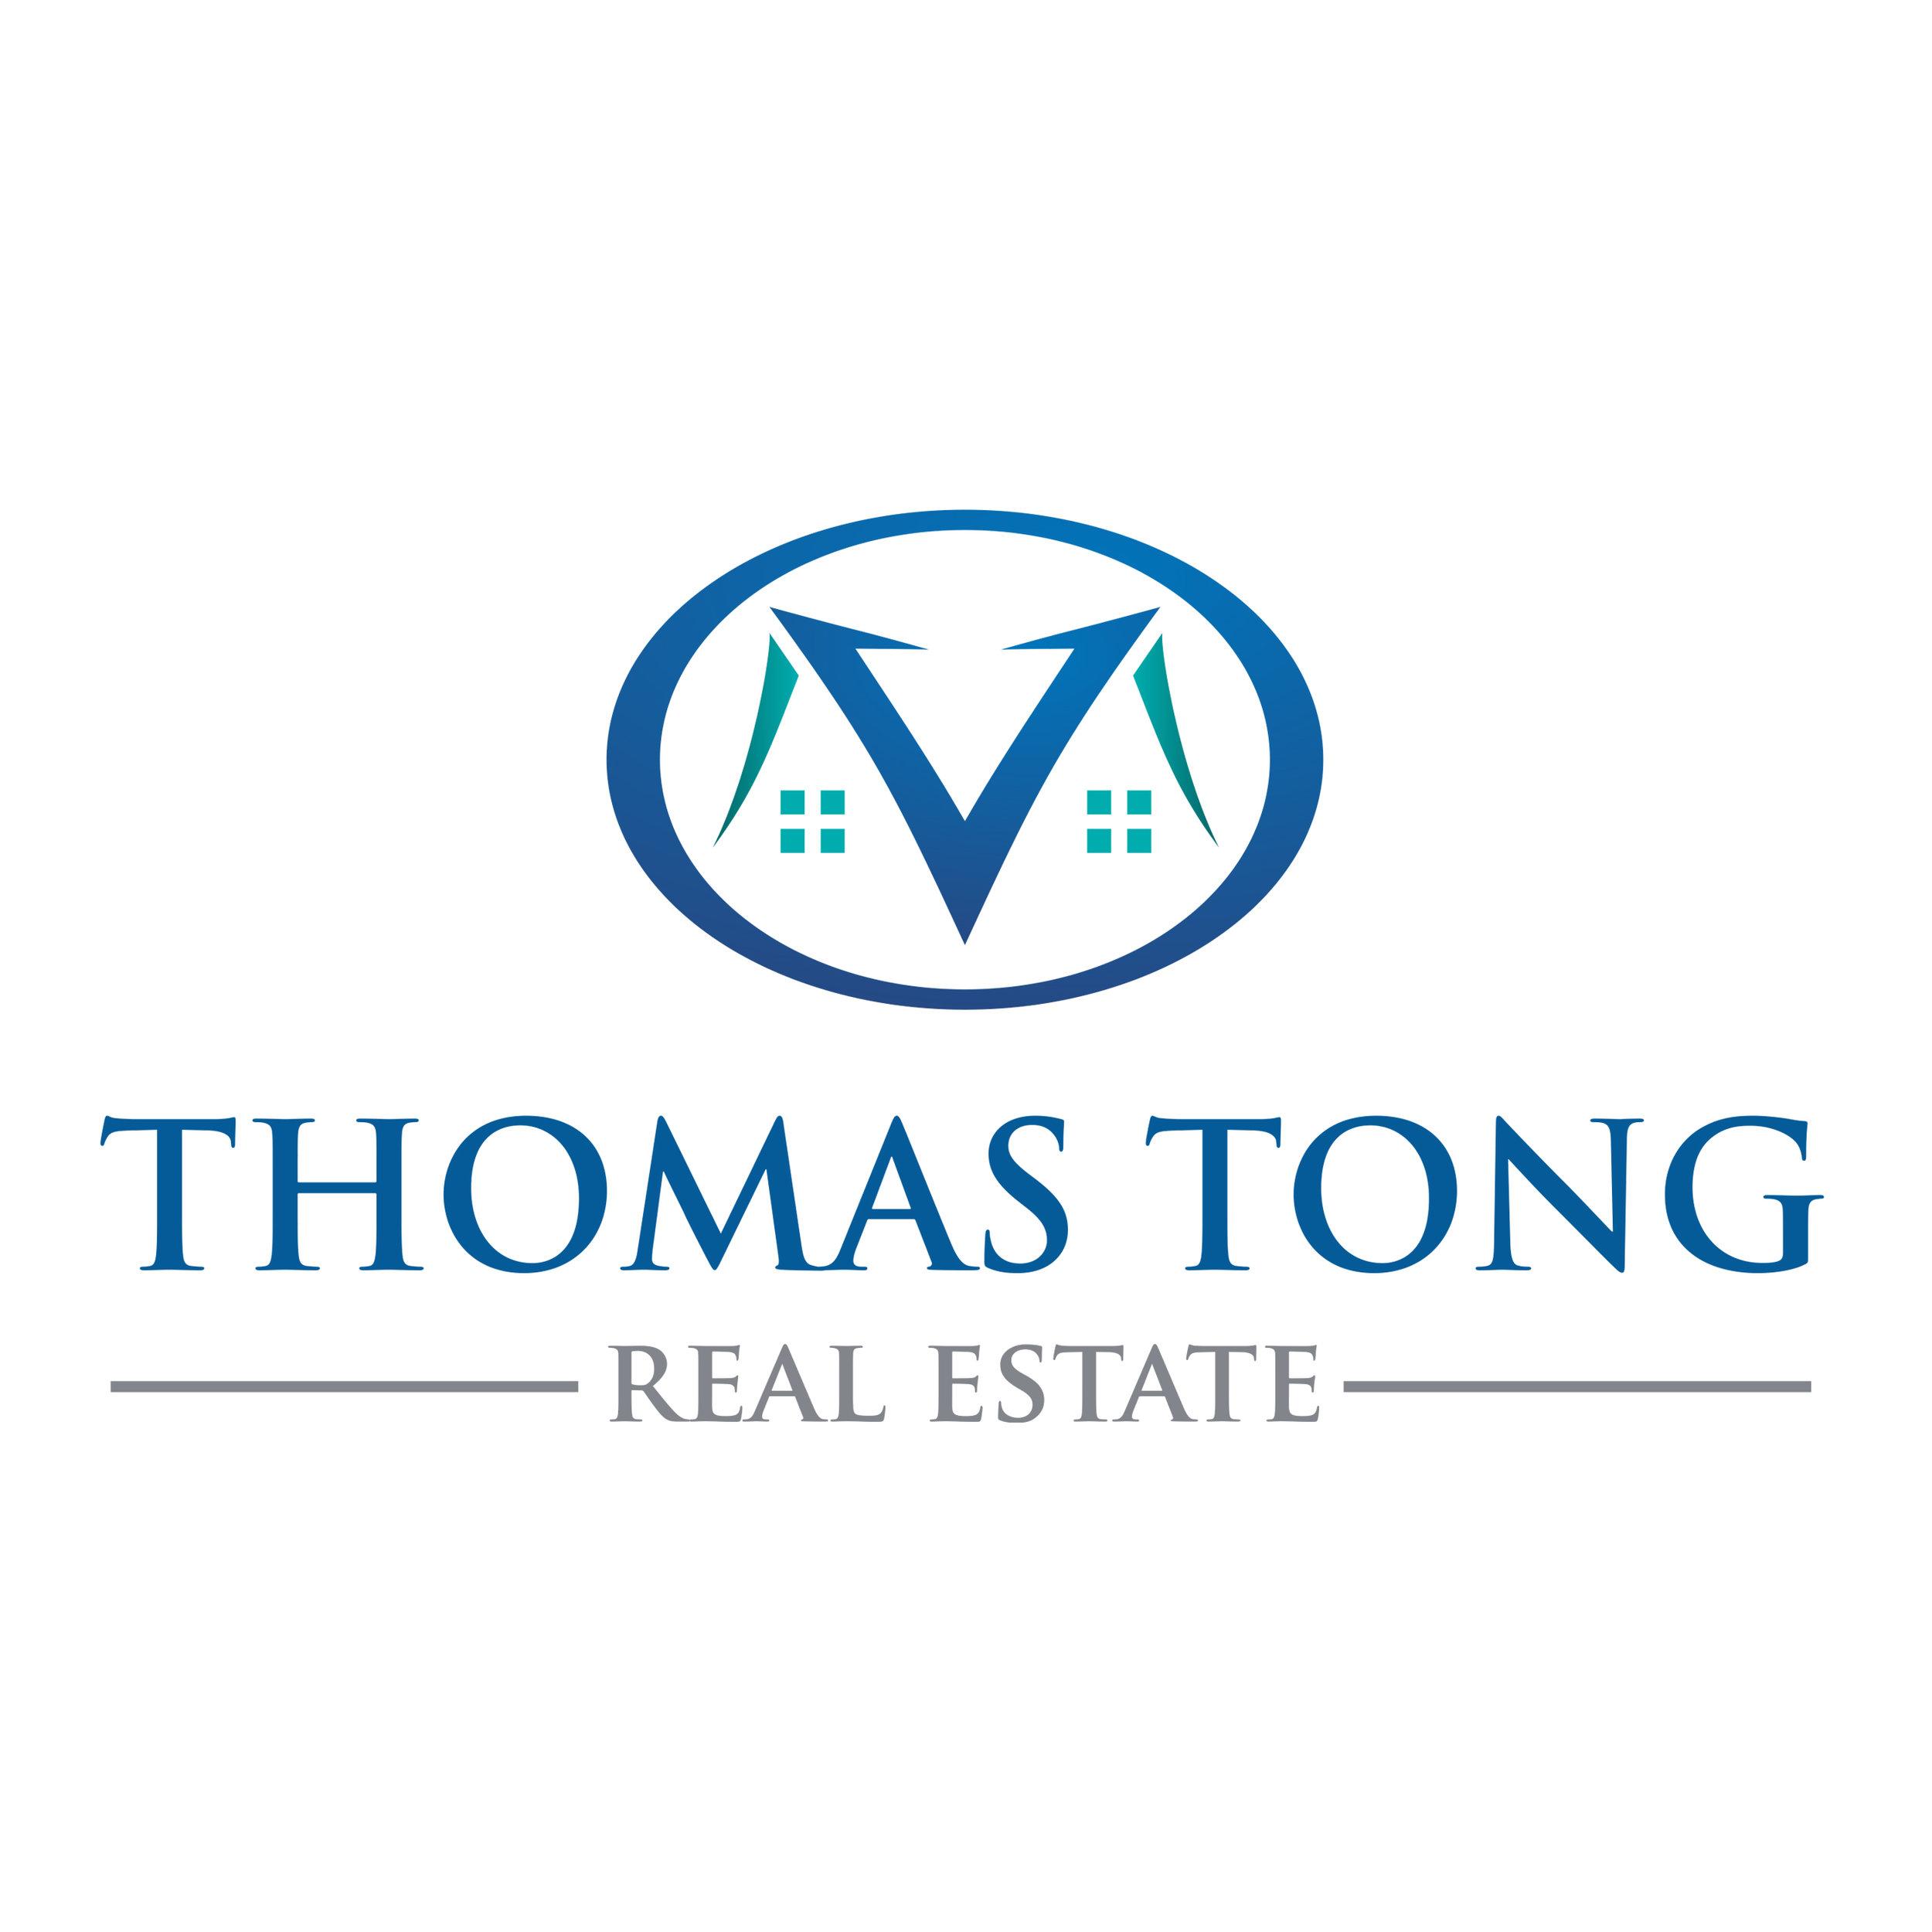 Thomas Tong Real Estate - Logo - By The EMMS